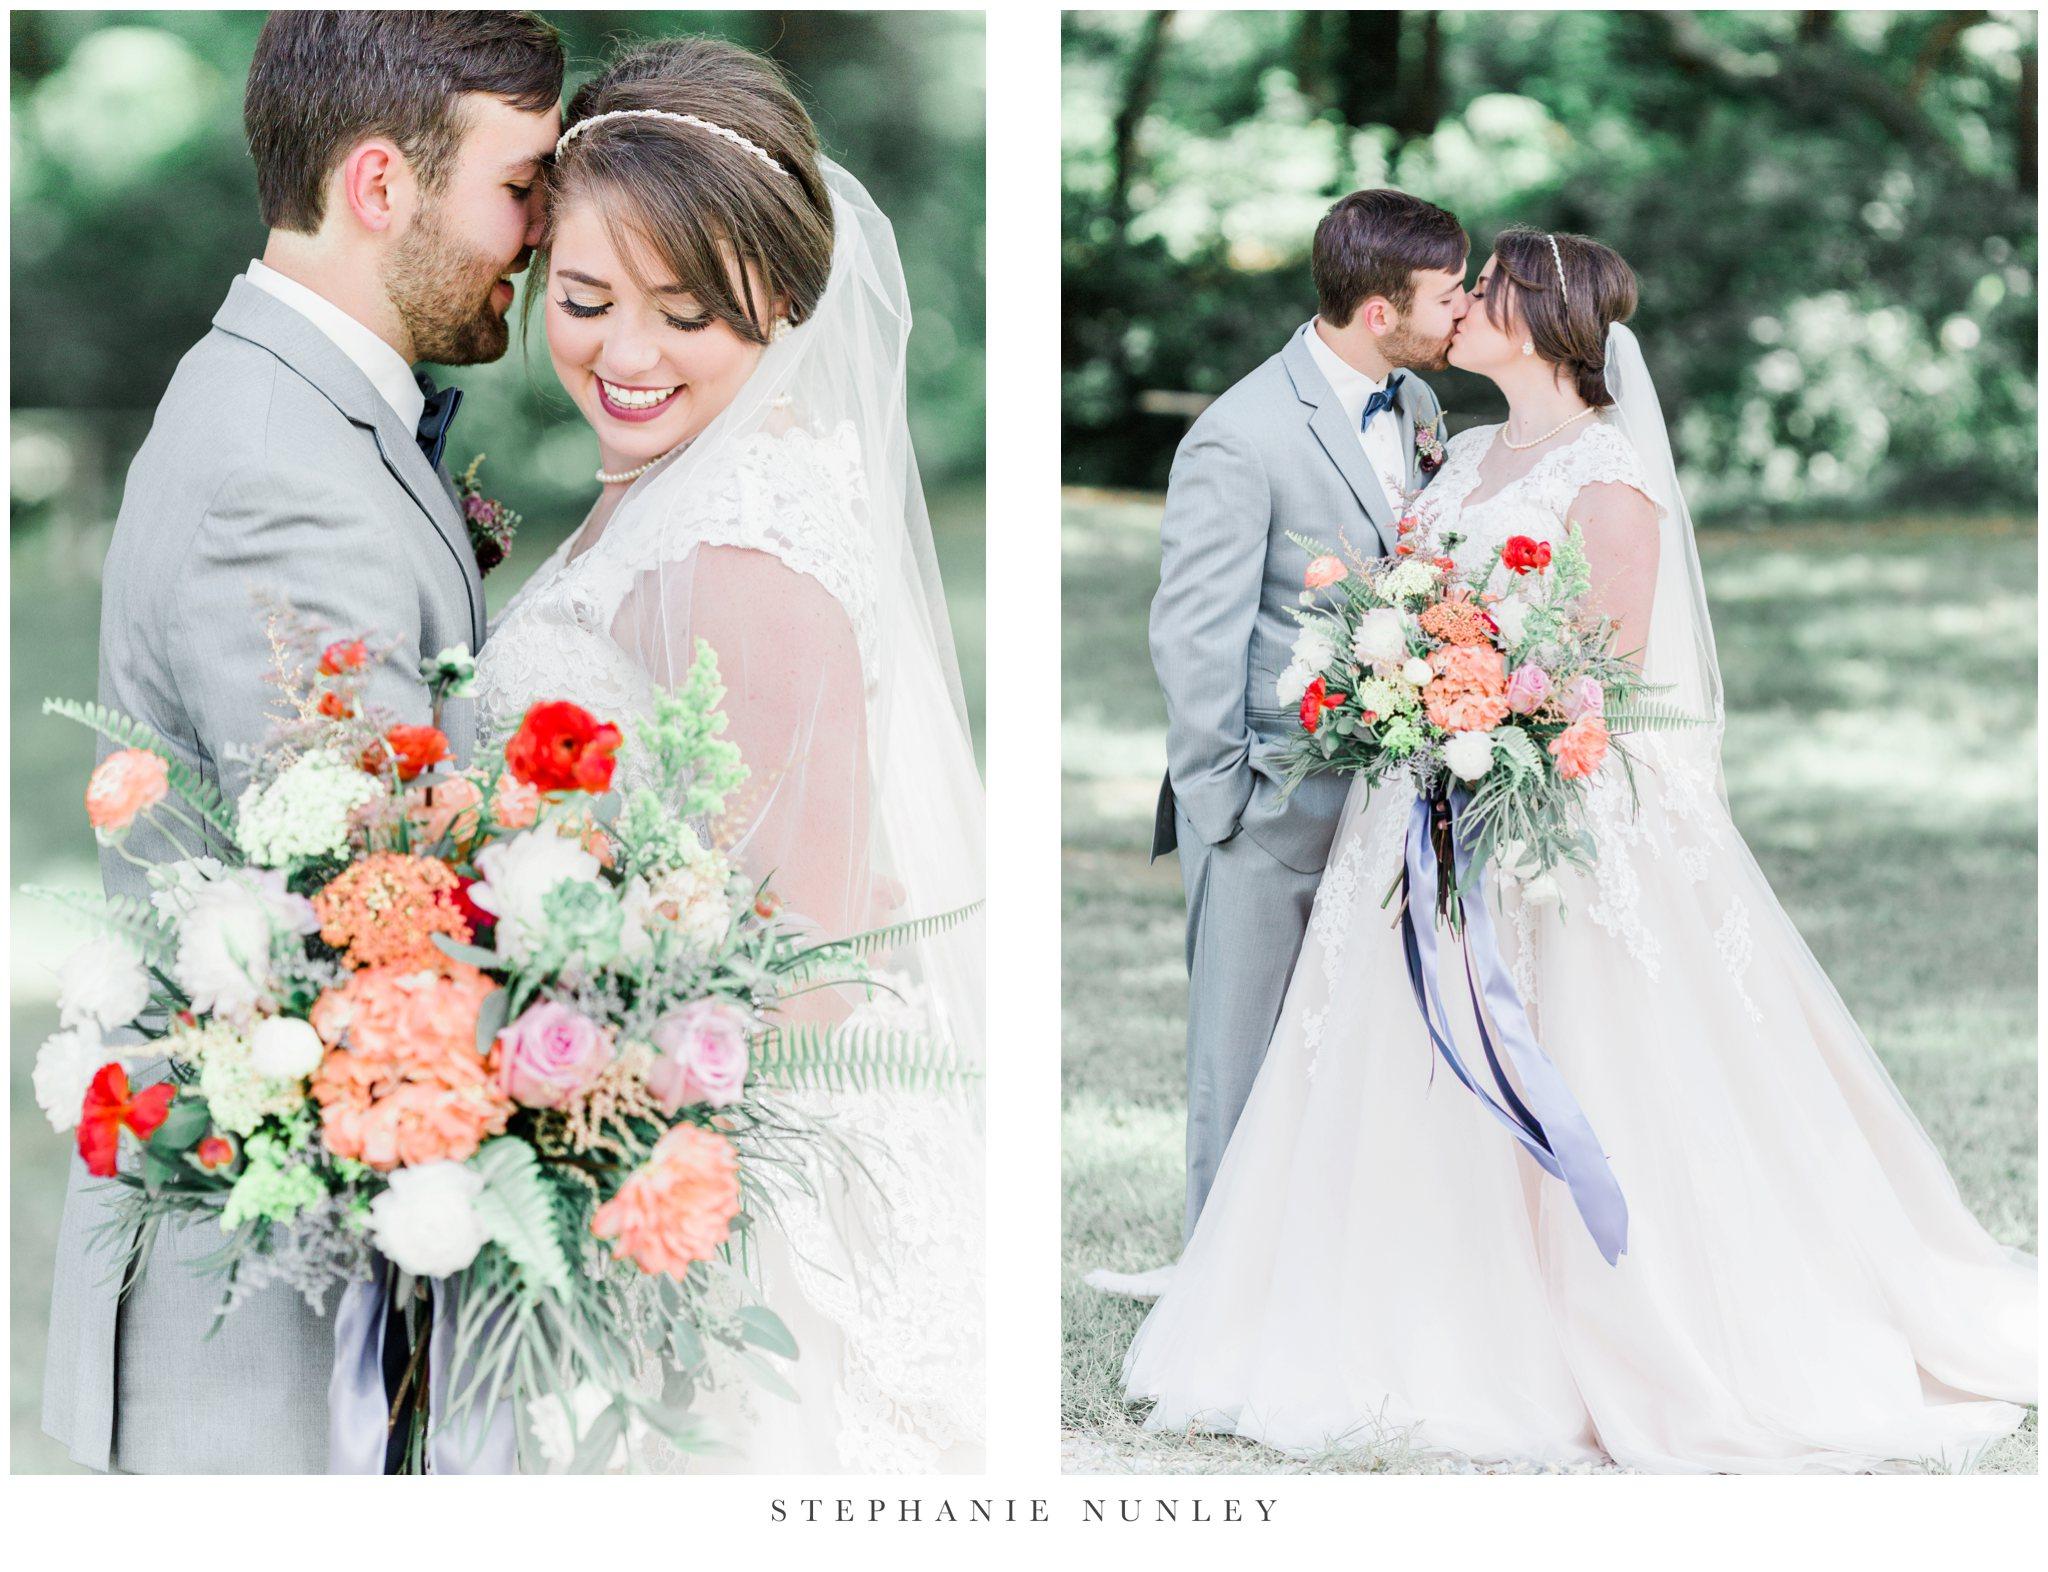 arkansas-wedding-with-lush-wildflower-bouquet-0054.jpg